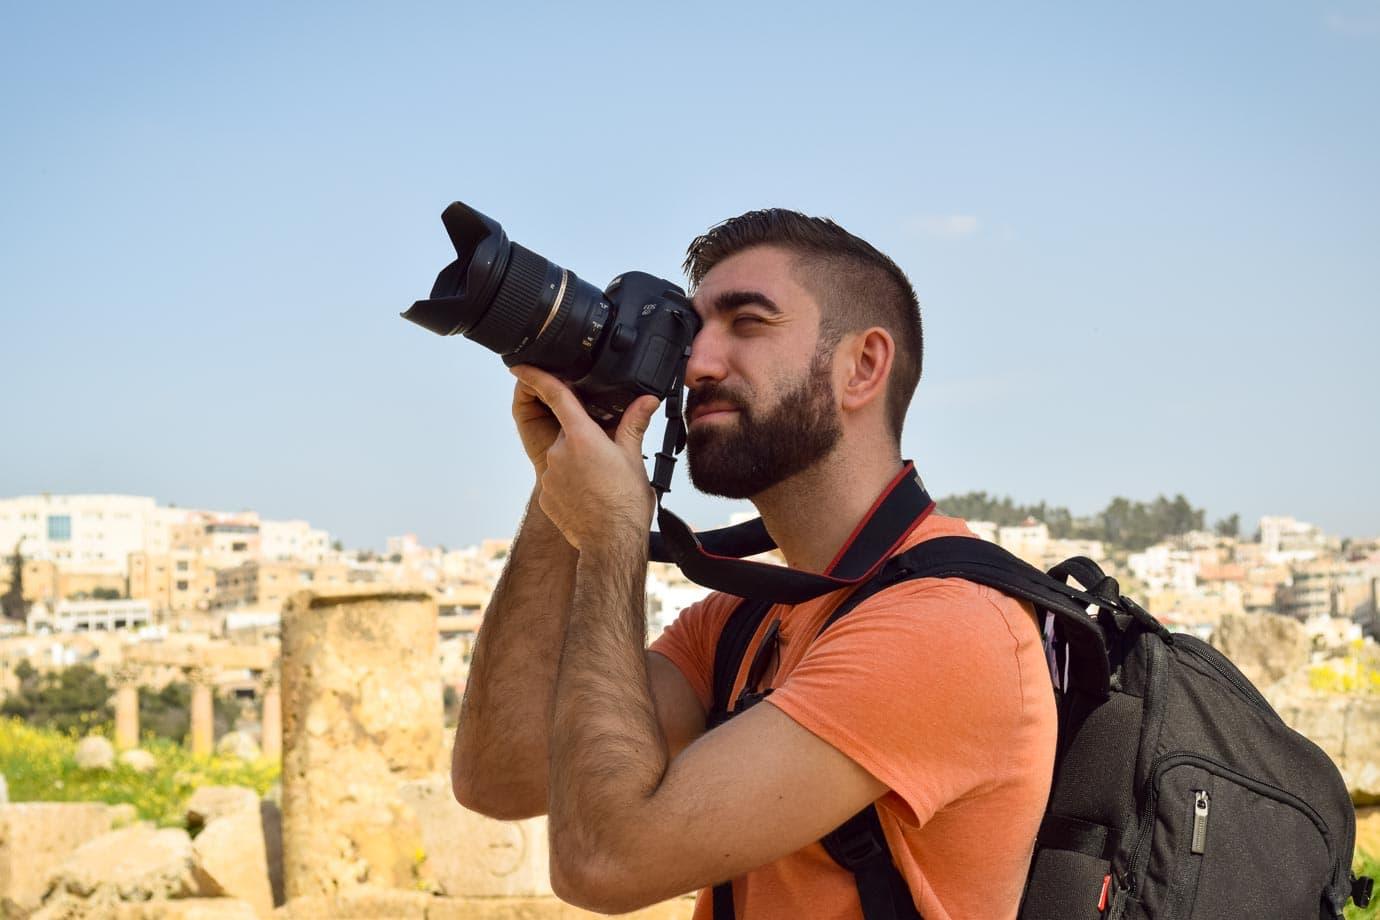 Taking photos abroad